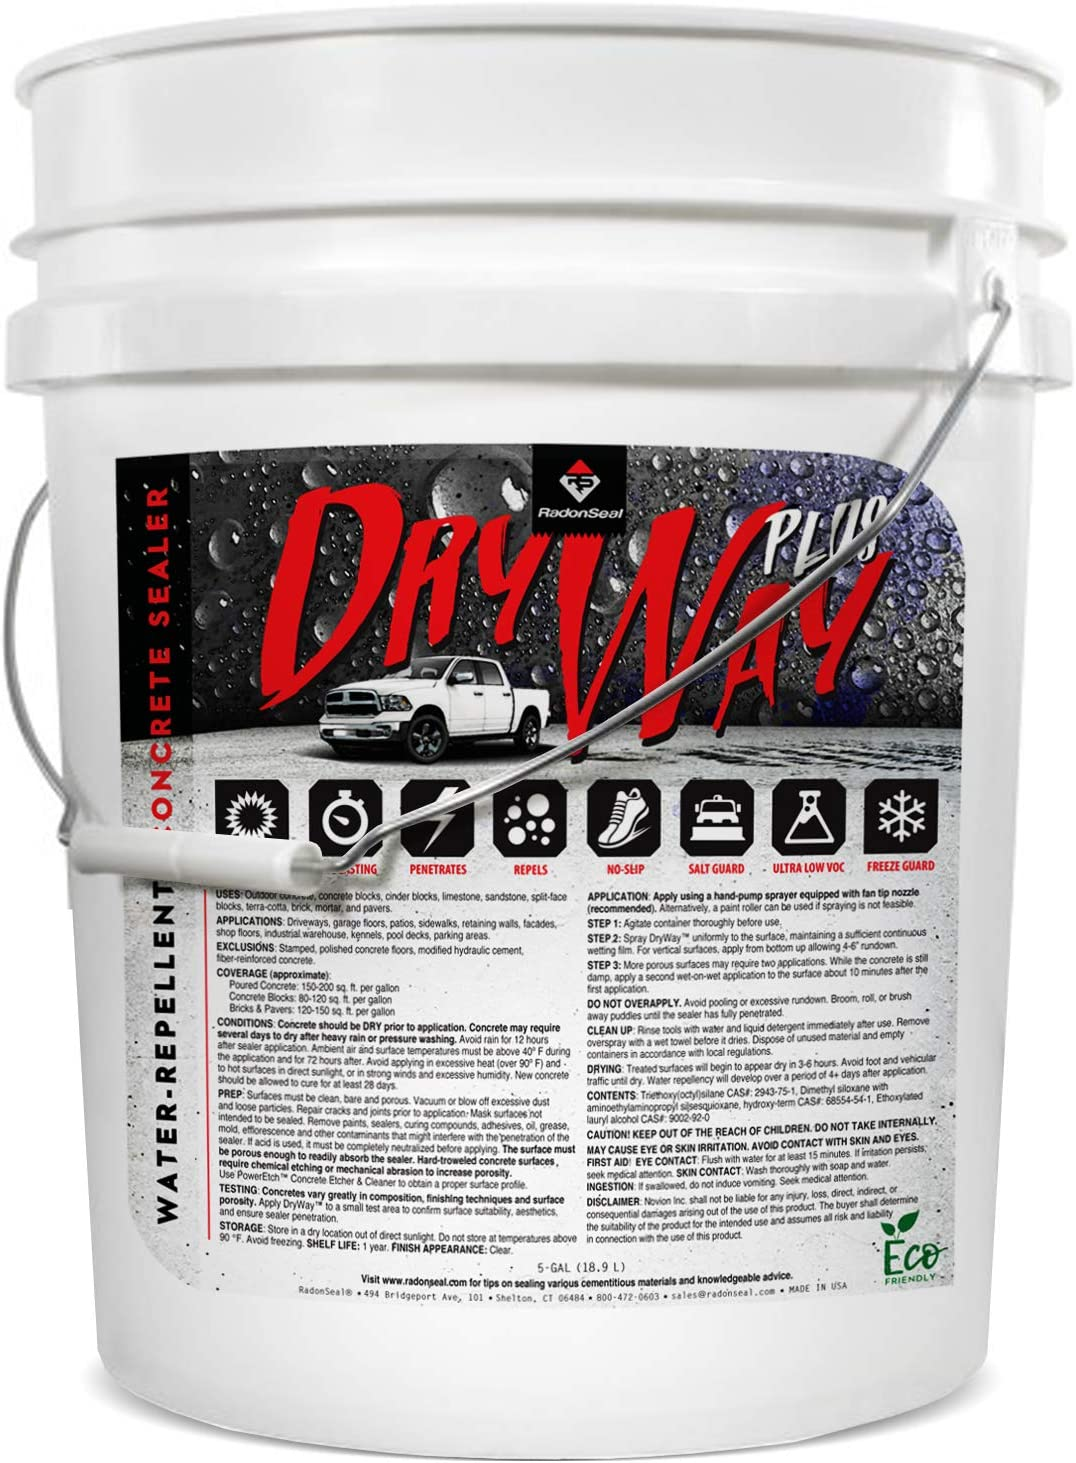 DryWay Plus - Water-Repellent Concrete Sealer. Penetrating Water-Based Sealer for Concrete Driveways, Patios, Sidewalks, & Pool Decks. No Gloss. Salt, Freeze/Thaw, Stain Protection (5-Gal)